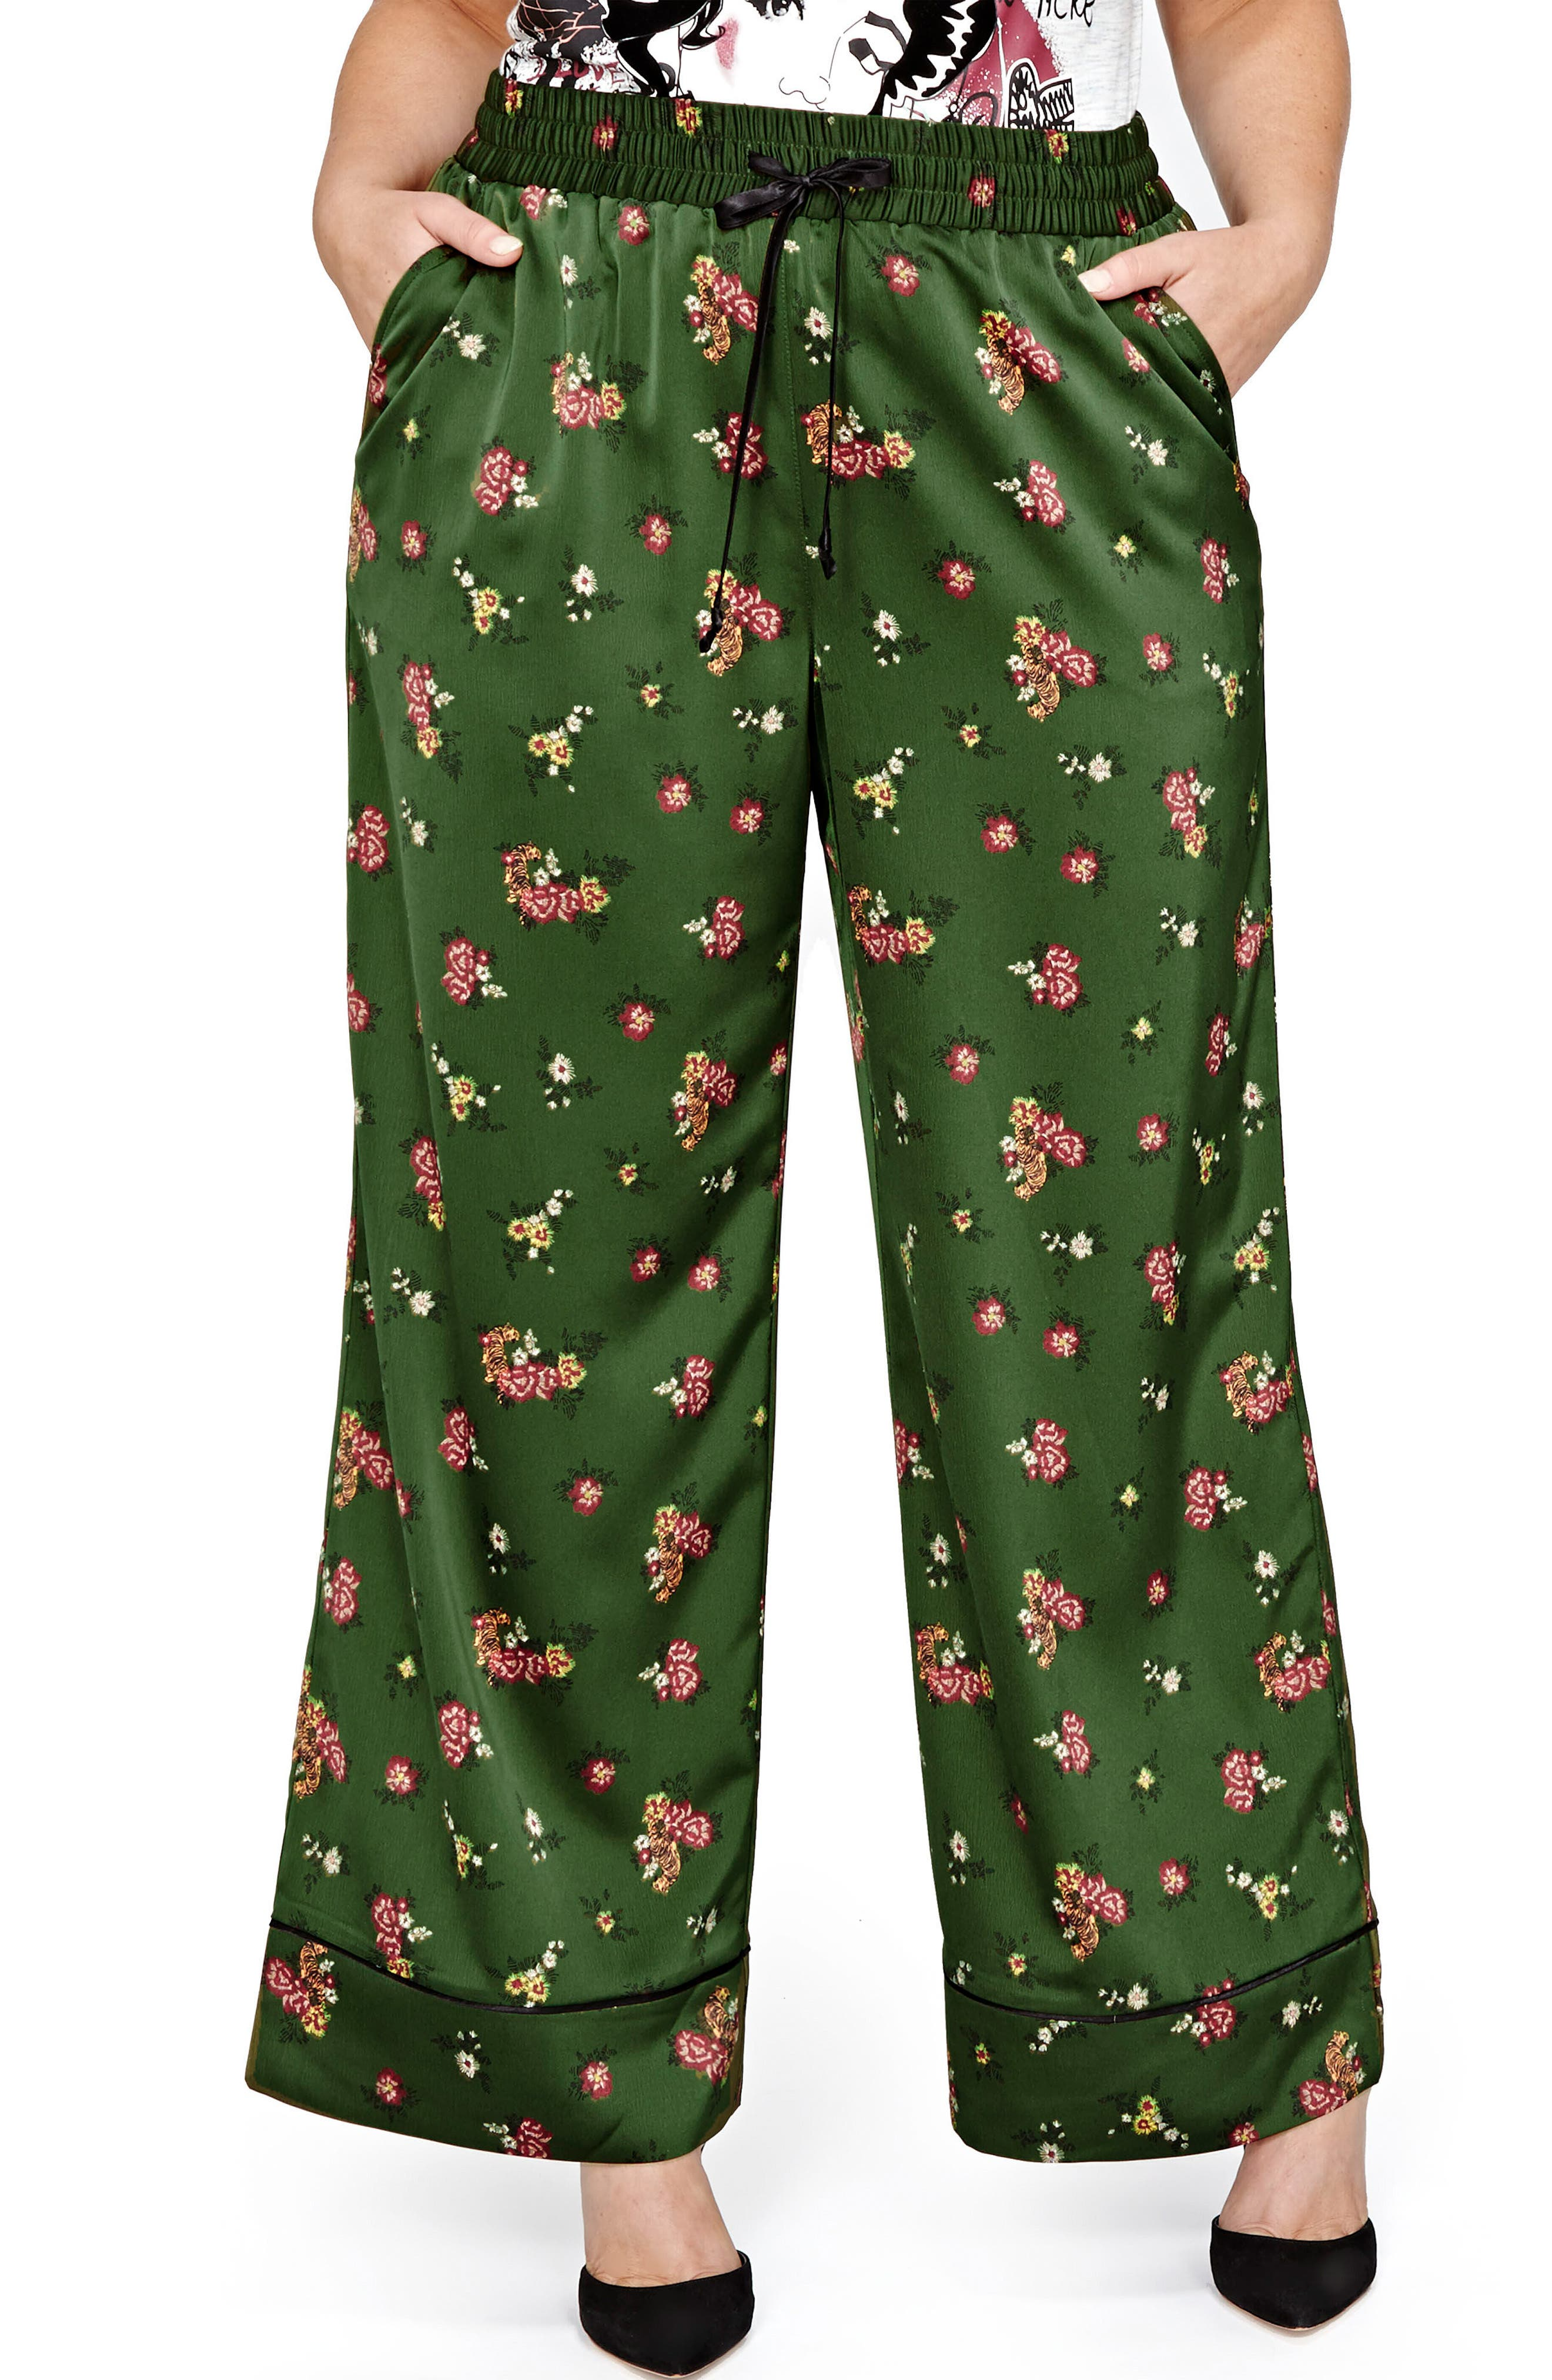 Jordyn Woods Wide-Leg Satin Pants,                             Main thumbnail 1, color,                             Deep Khaki Floral Aop